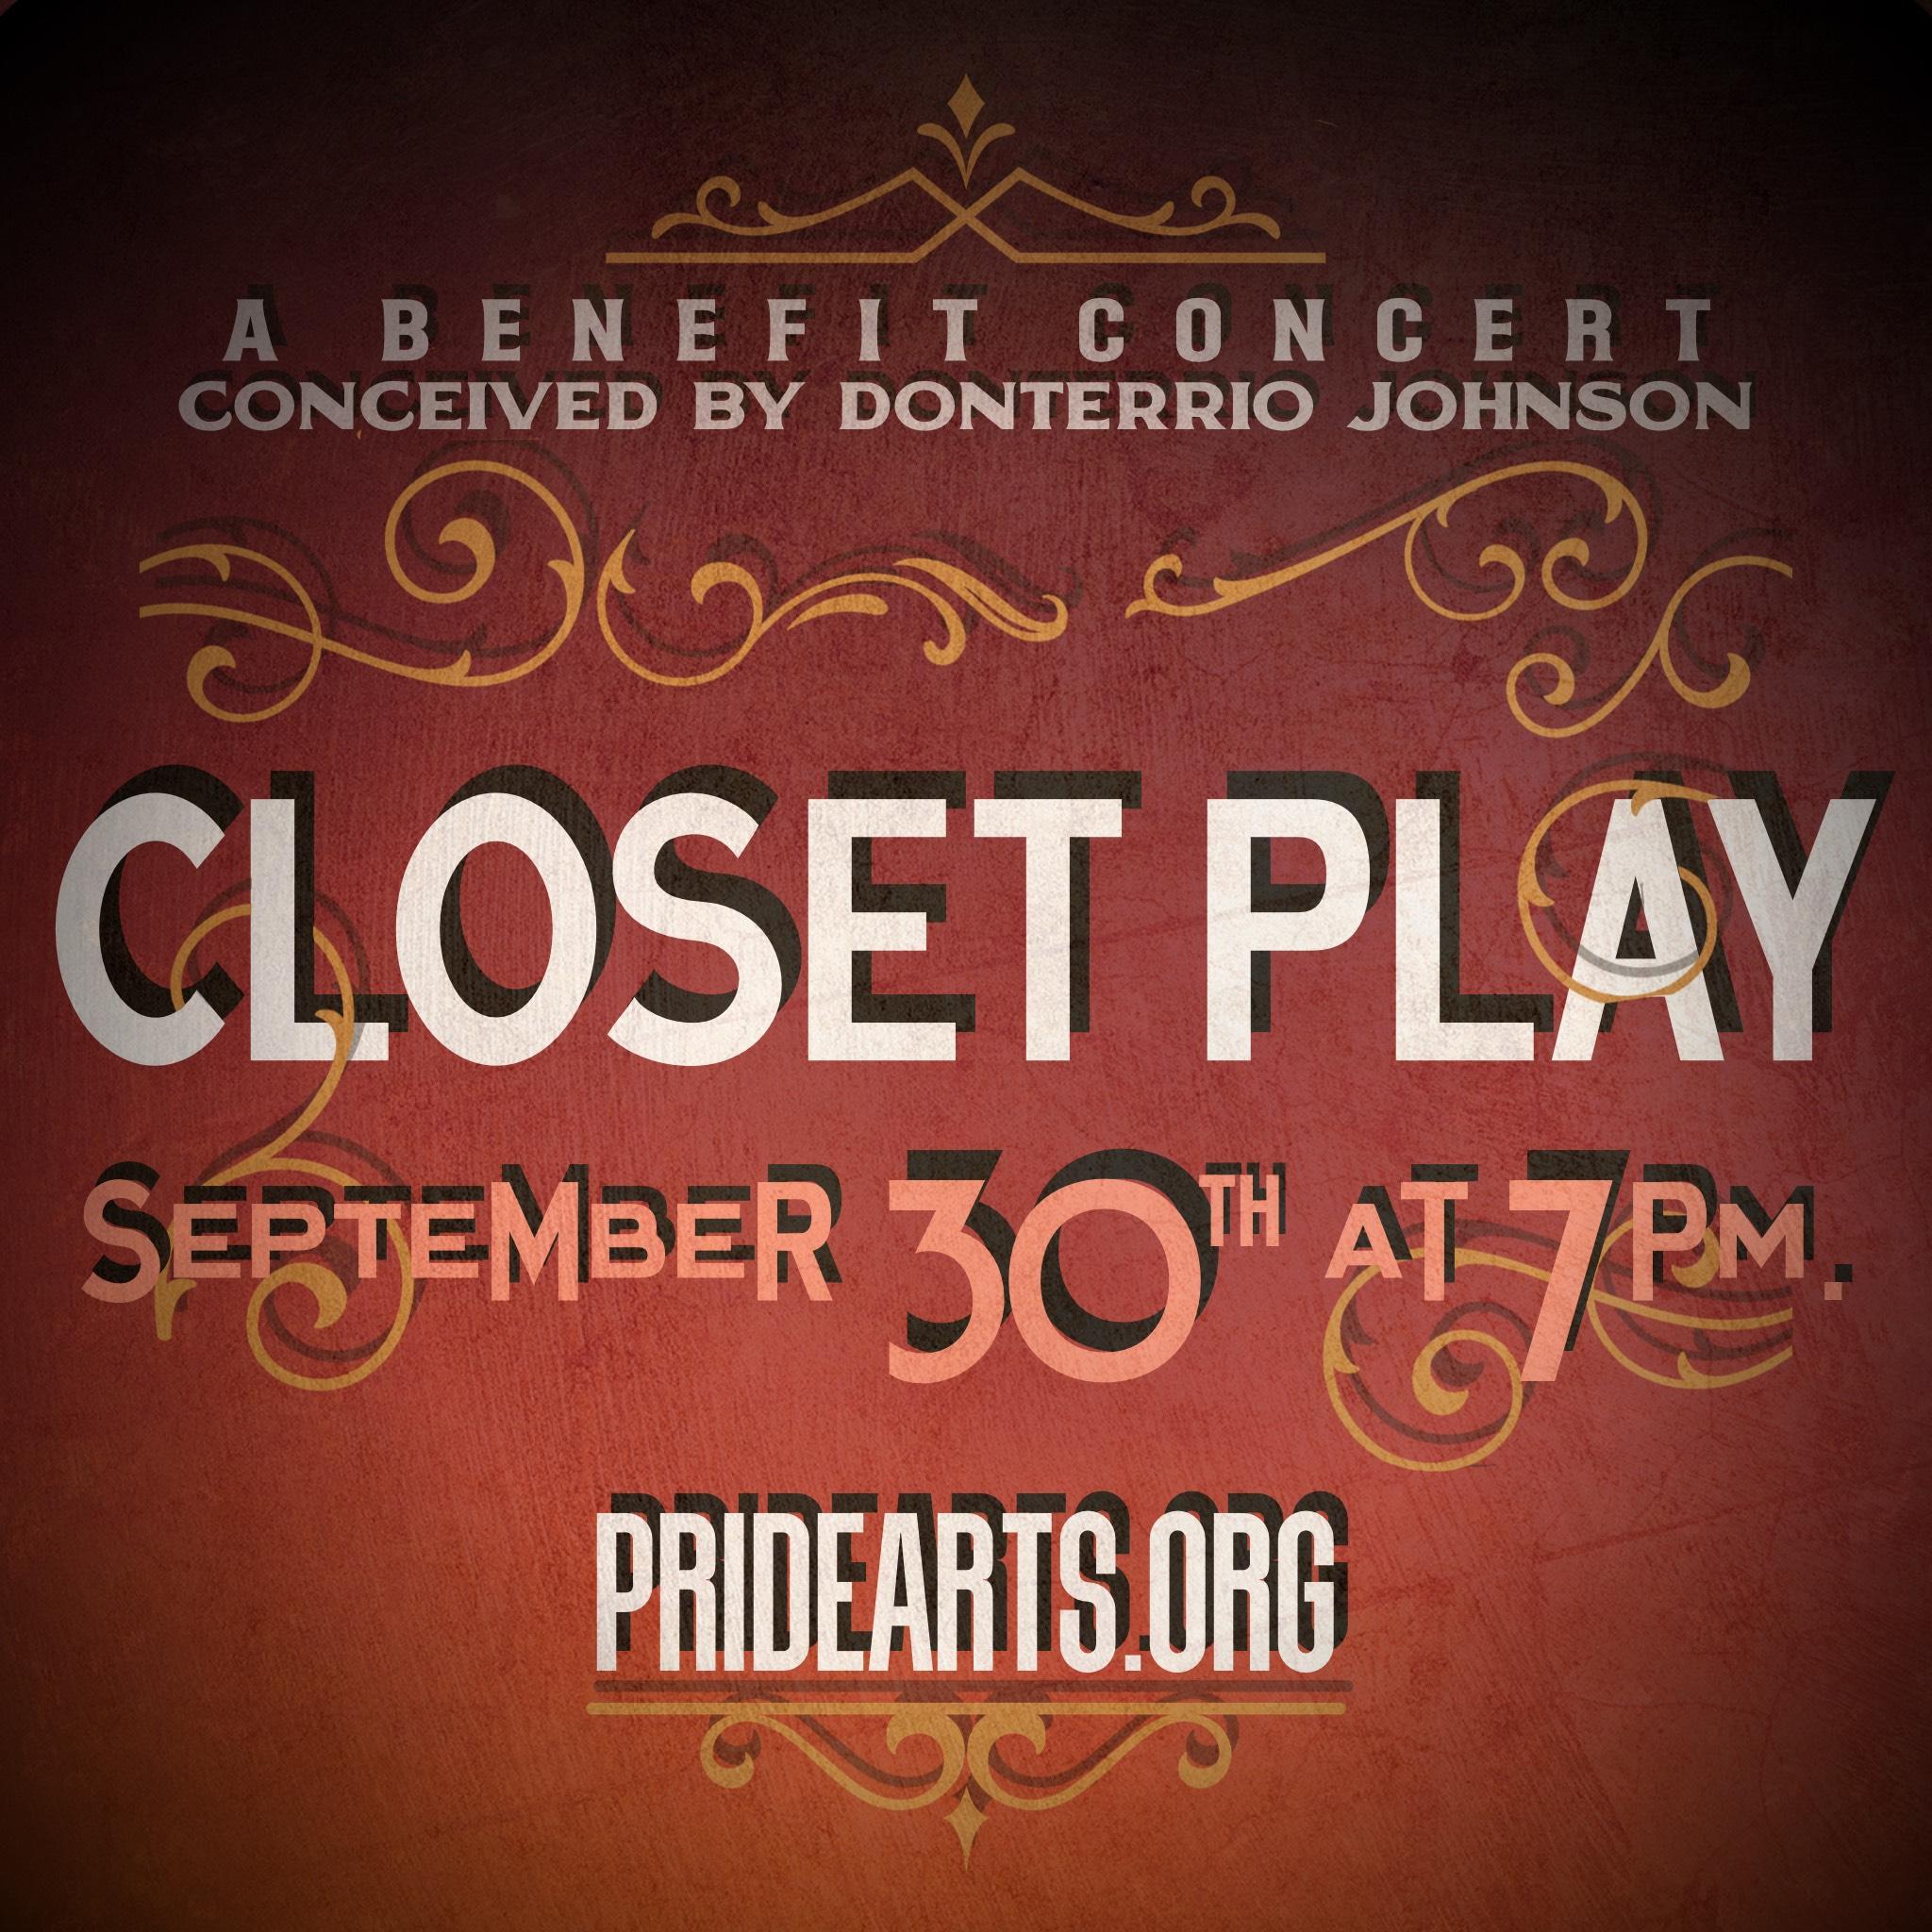 Closet Play